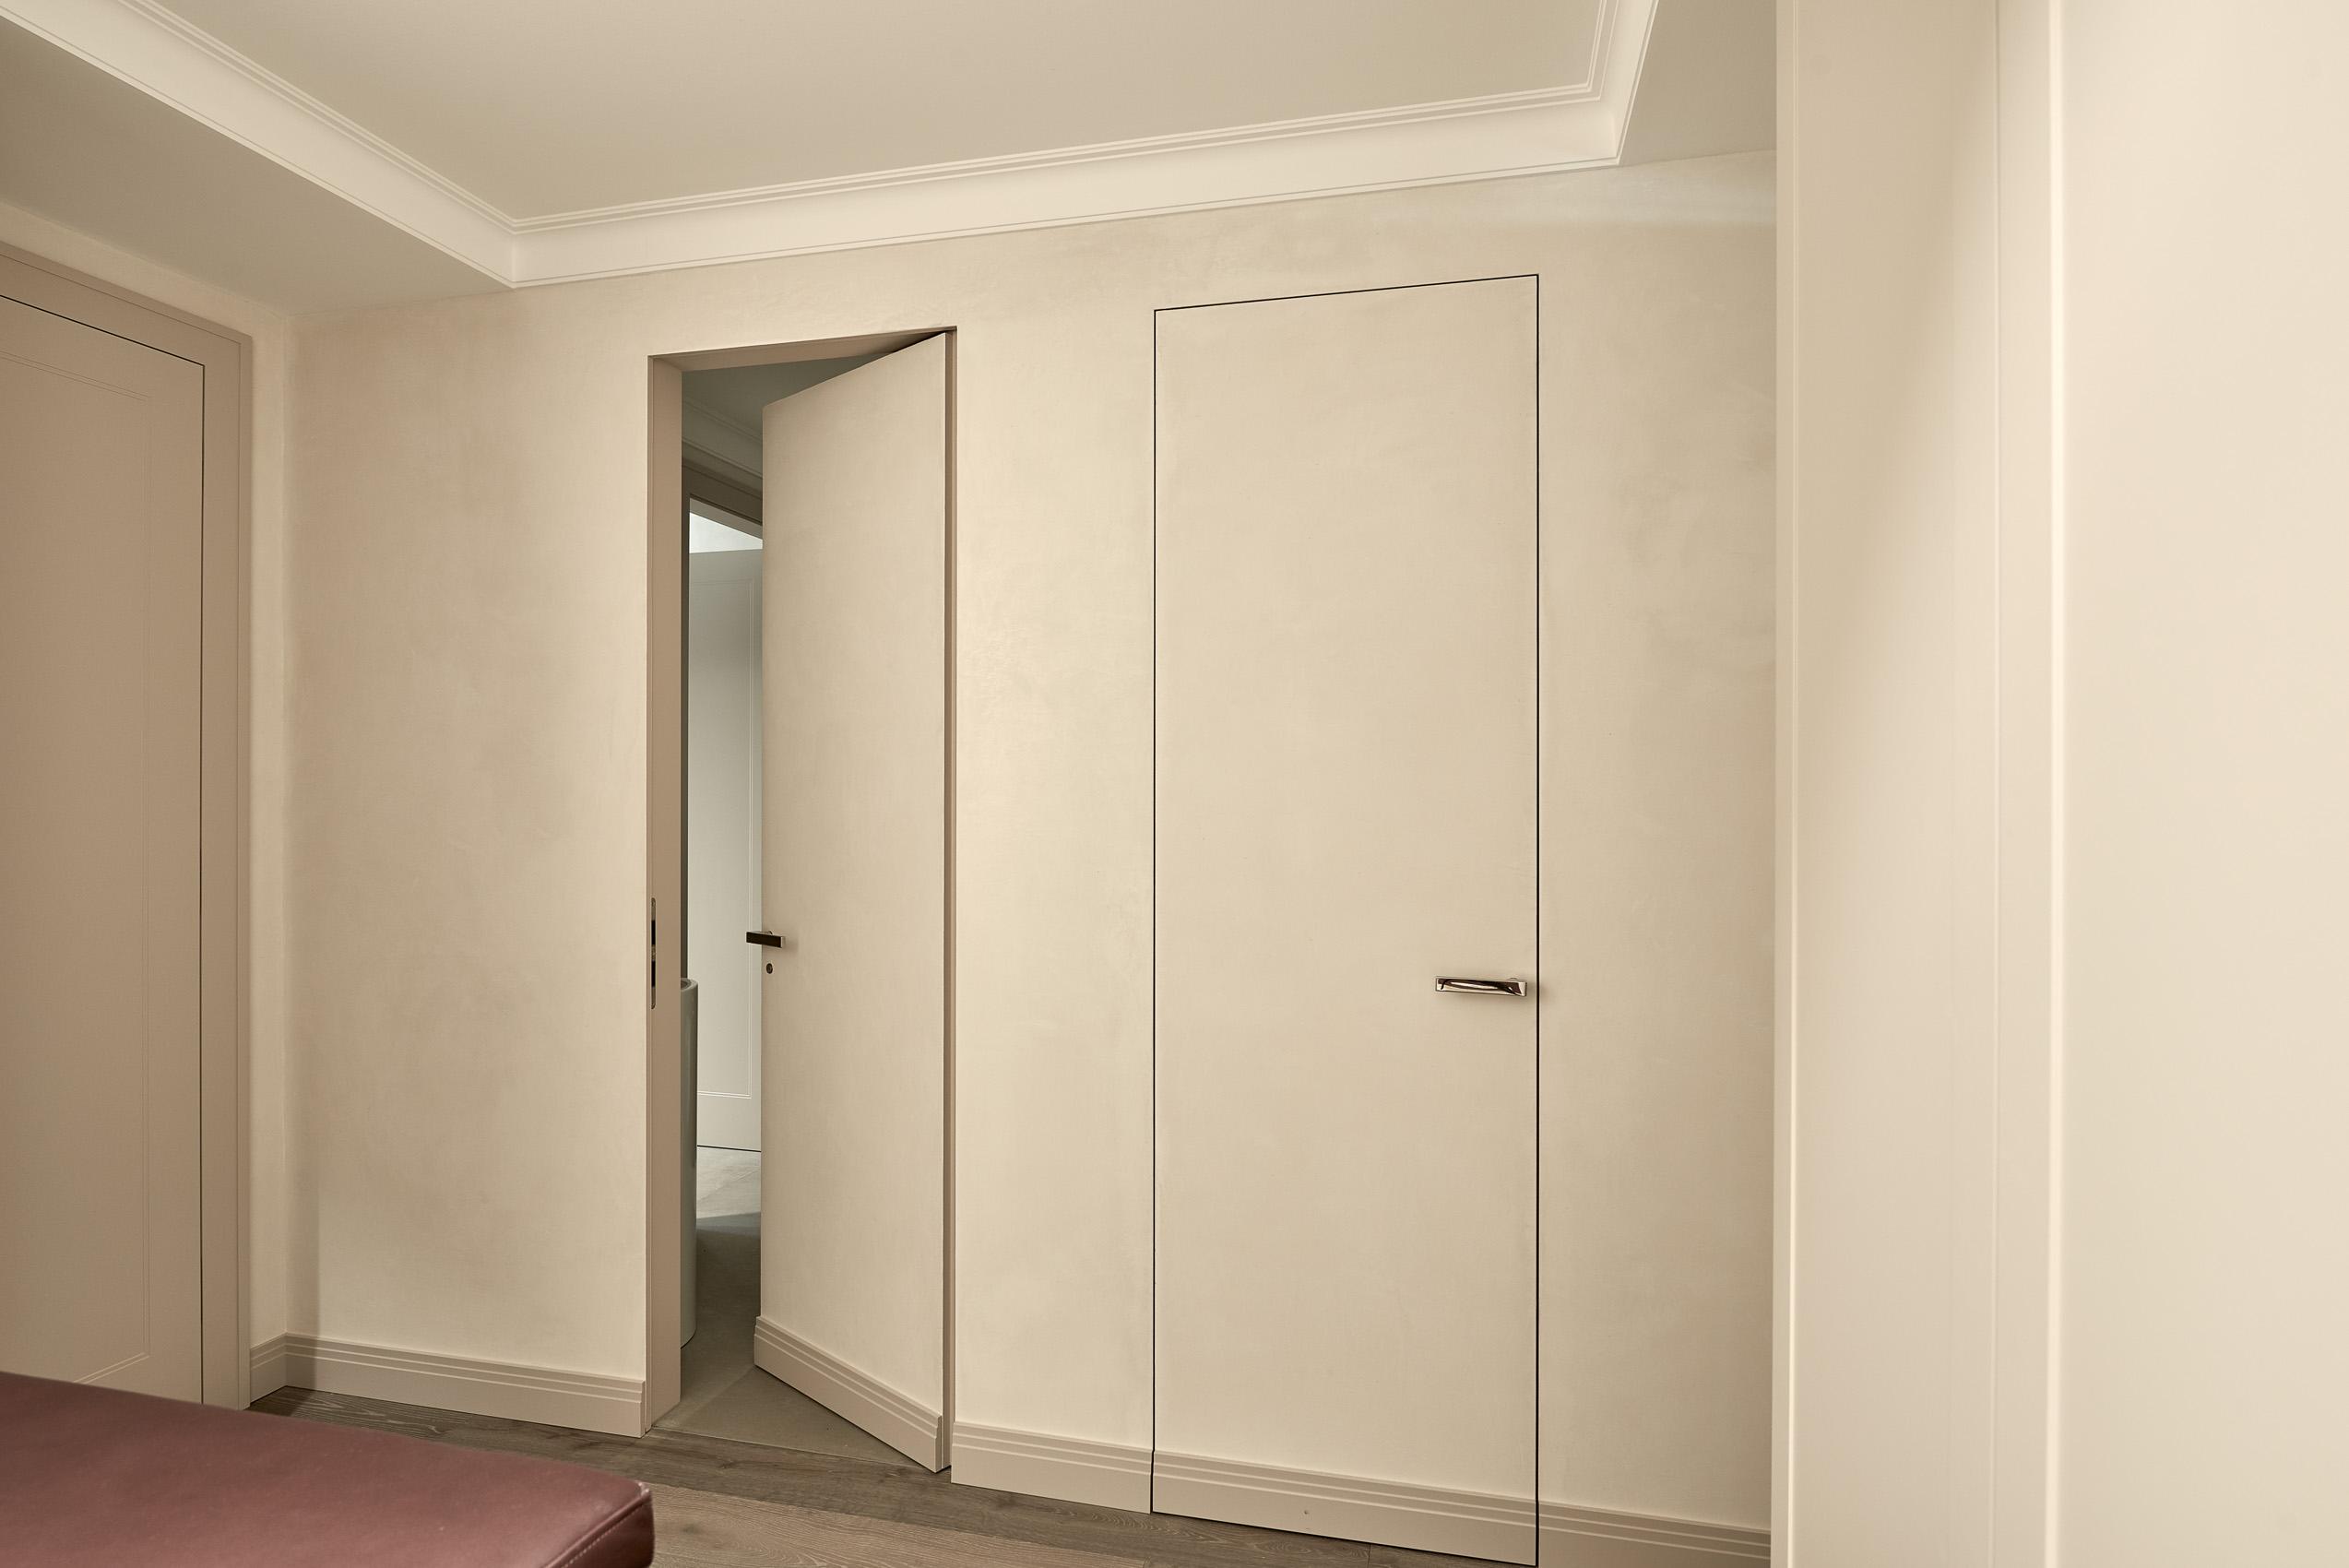 elemente ohne sichtbare zarge grauthoff t rengruppe. Black Bedroom Furniture Sets. Home Design Ideas